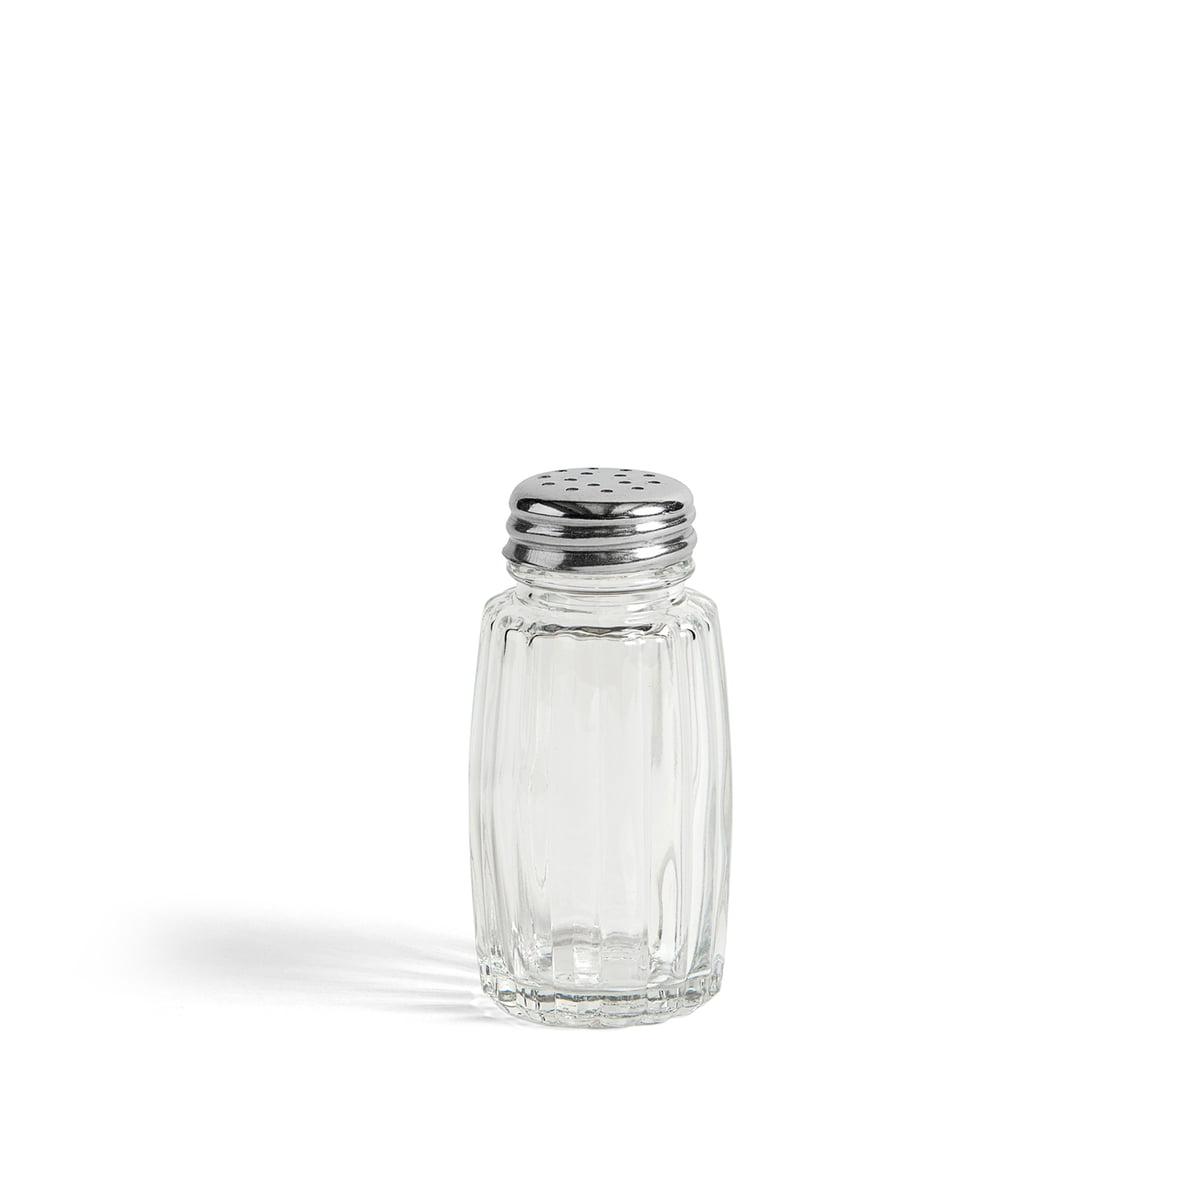 Italian Salt Shaker By Hay Connox